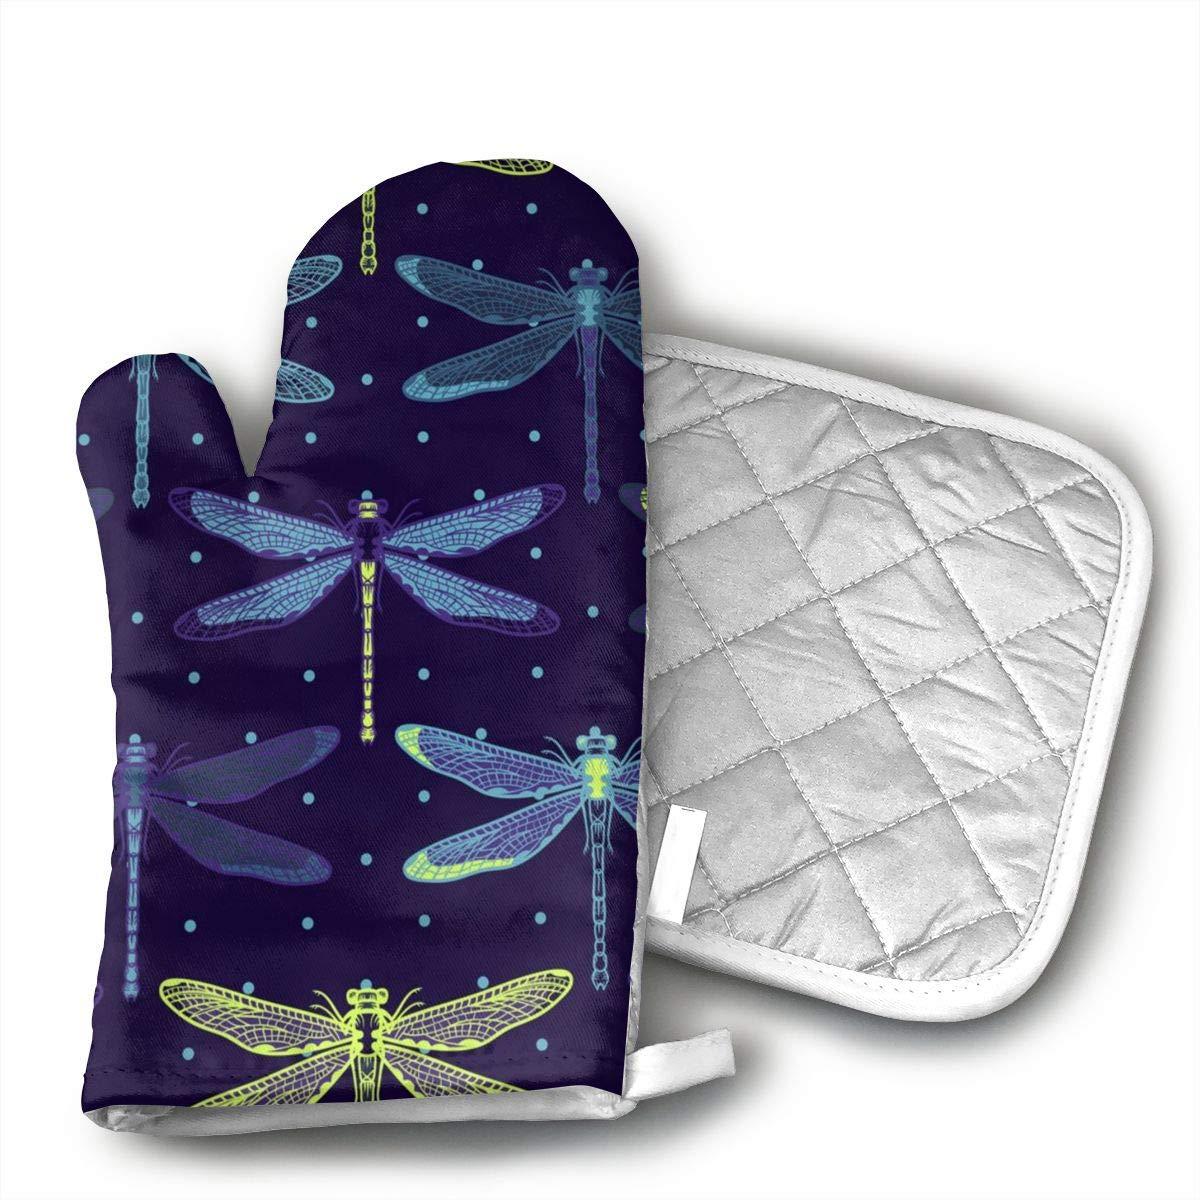 CASM Hand Drawn Stylized Dragonflies Pattern Premium Terylene/Nylon Oven Mitts and Pot mat,Pot mat/Hot Pads, Heat Resistant Gloves BBQ Kitchen